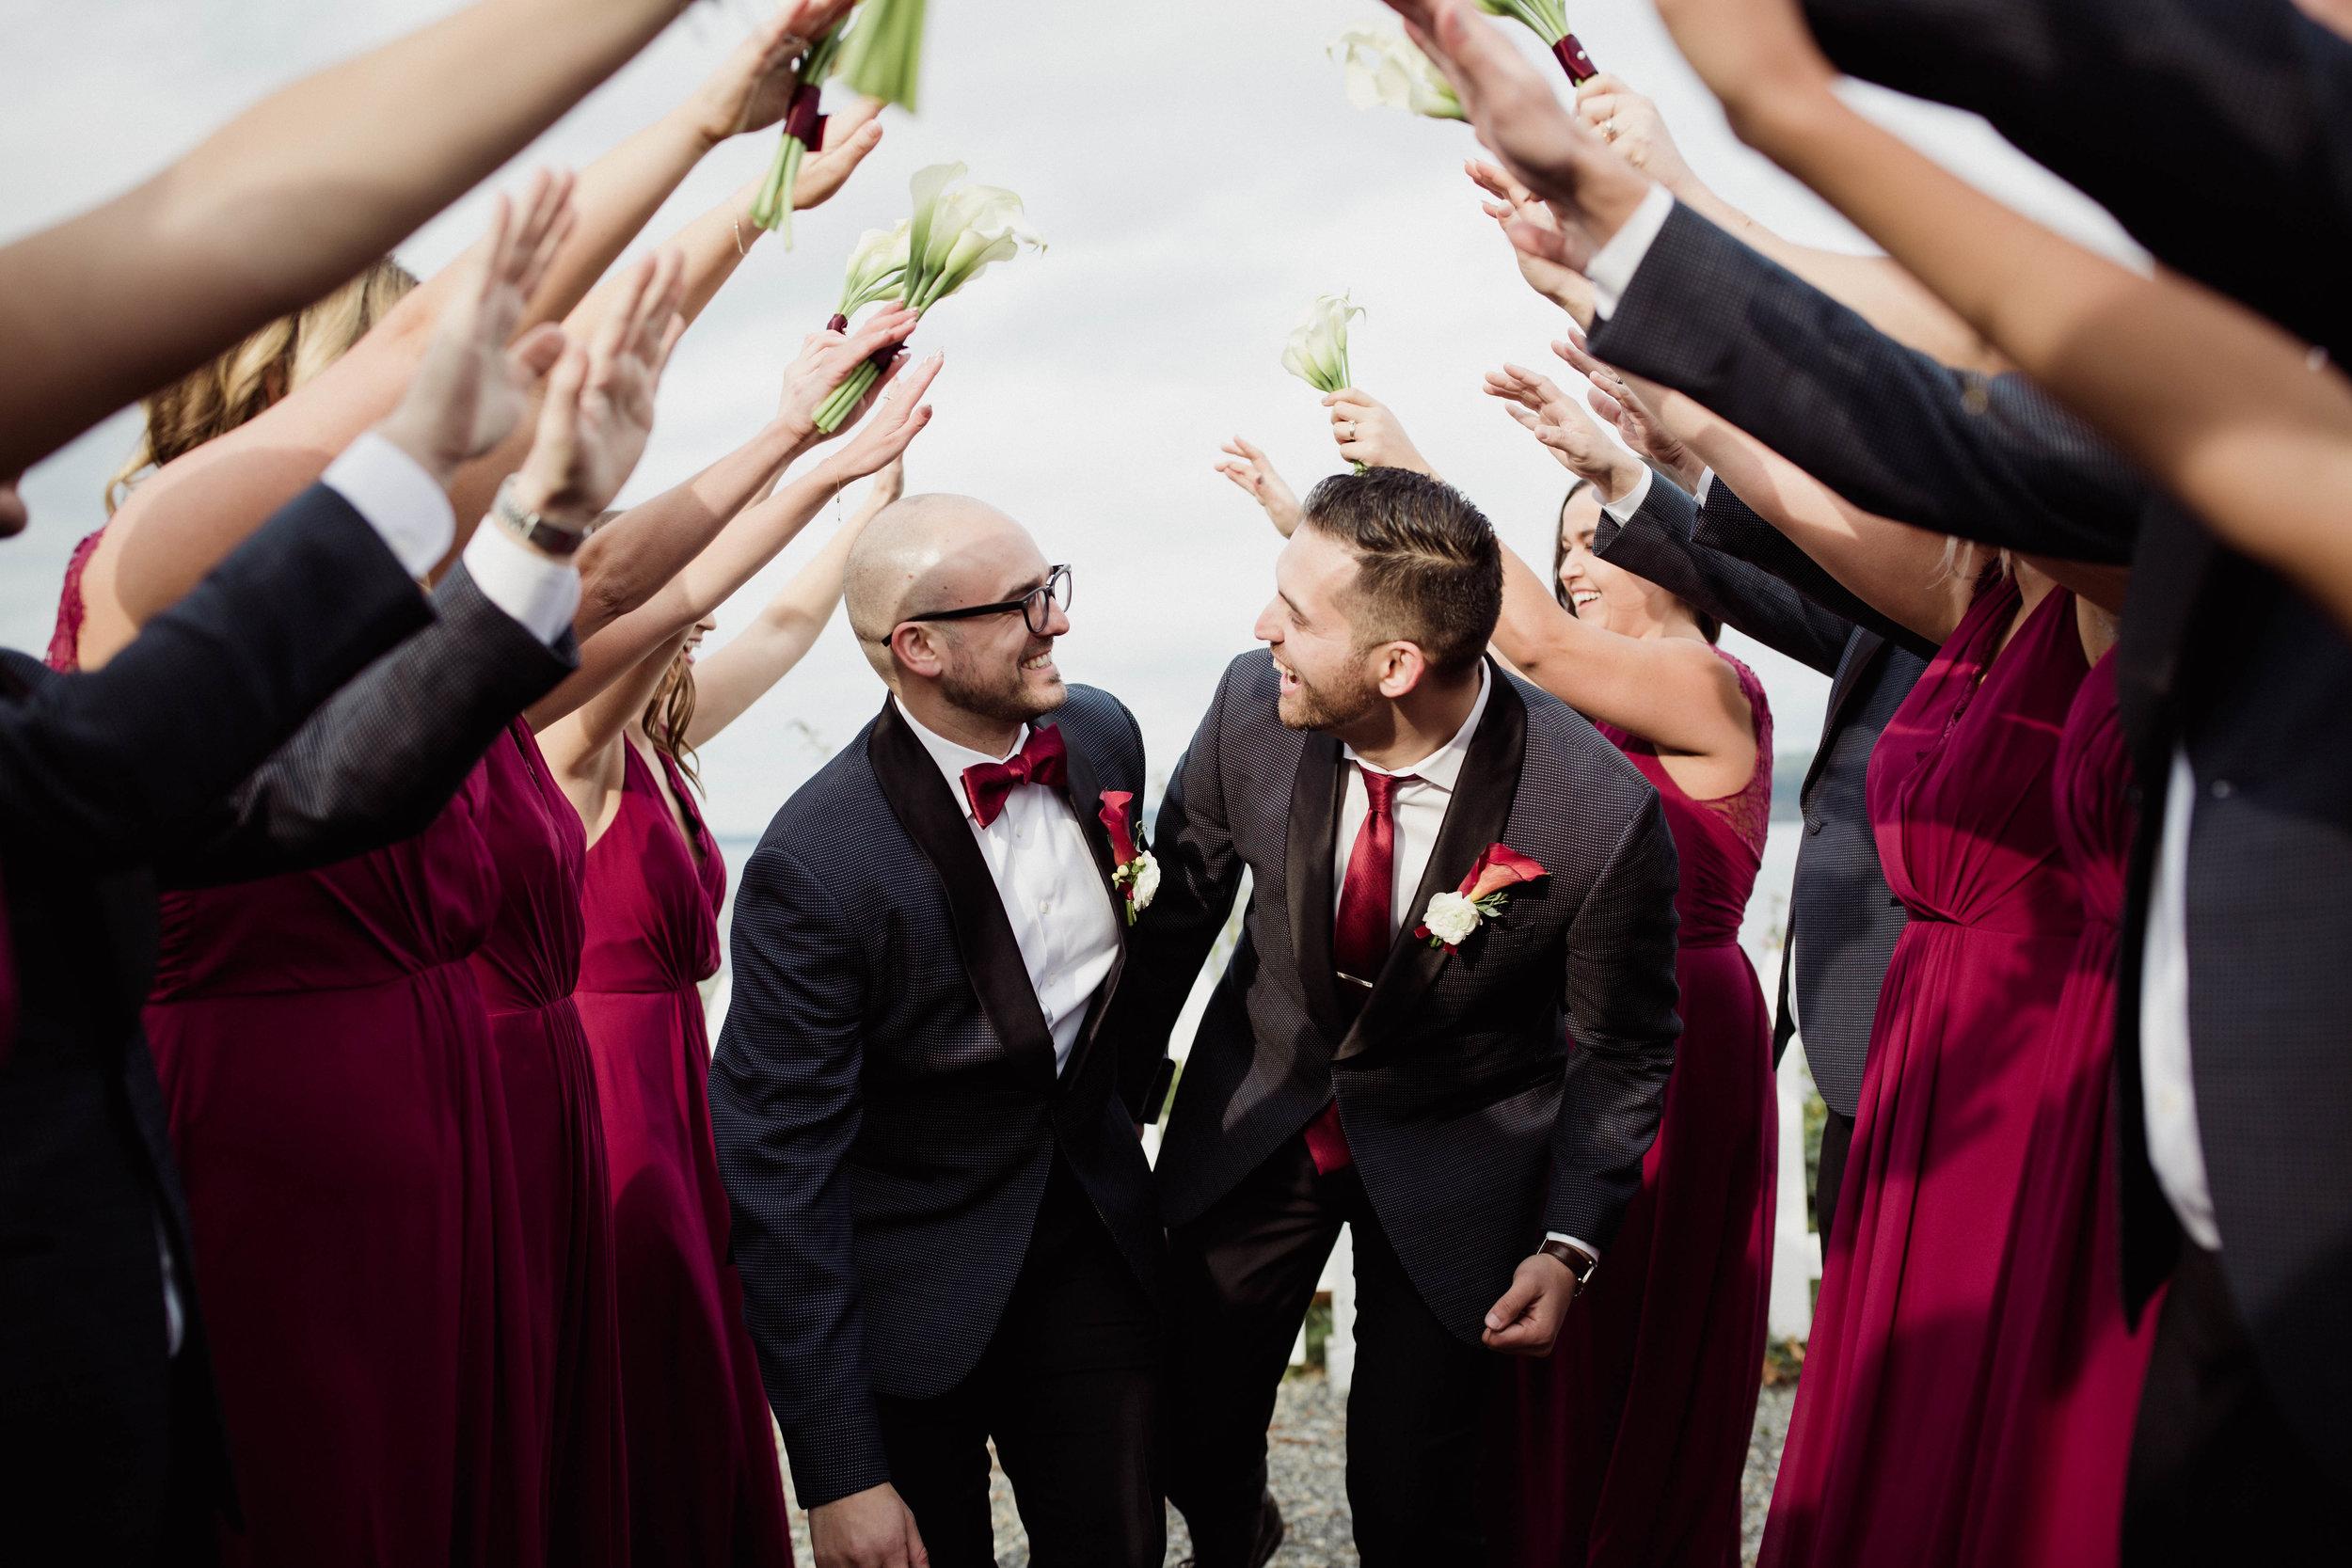 Mr. and Mr. | Olympia Wedding Photographer